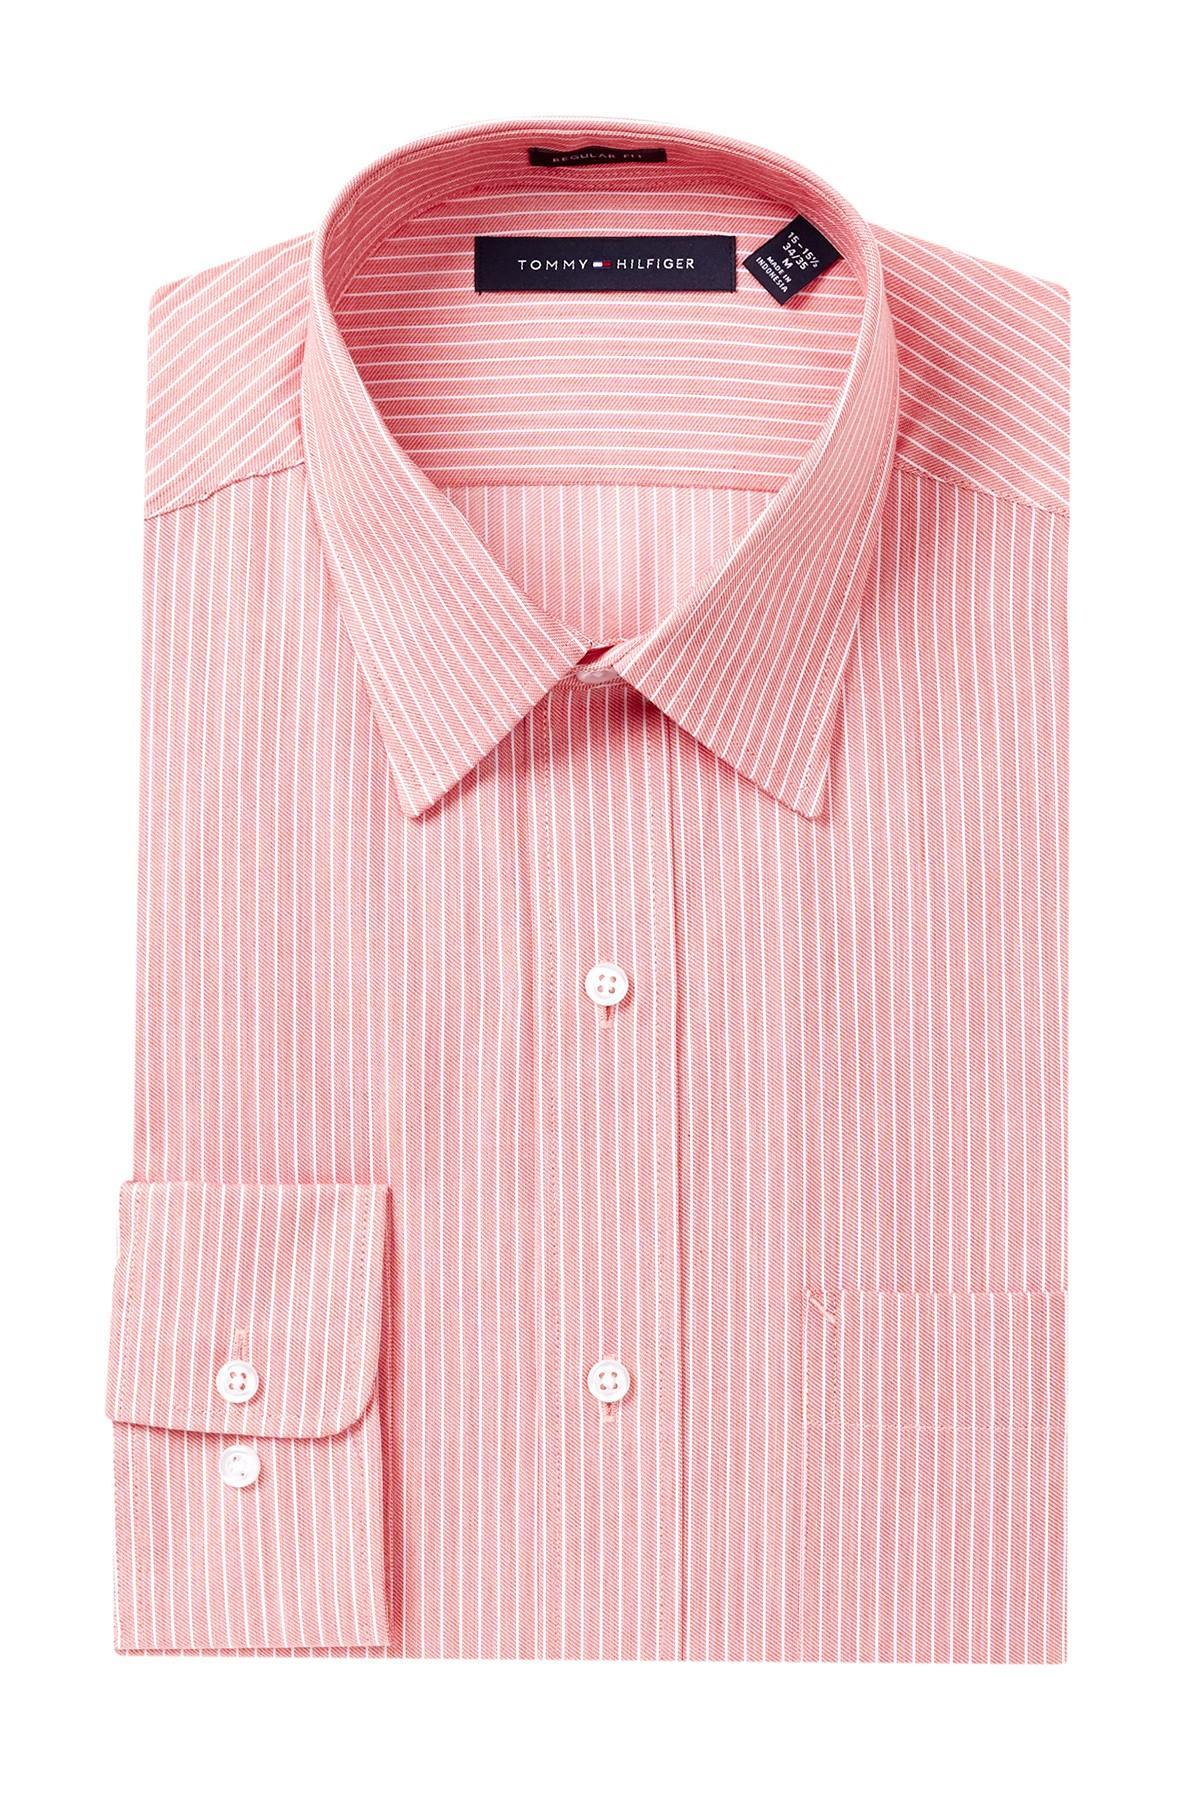 Tommy hilfiger striped regular fit dress shirt in pink for for Regular fit dress shirt